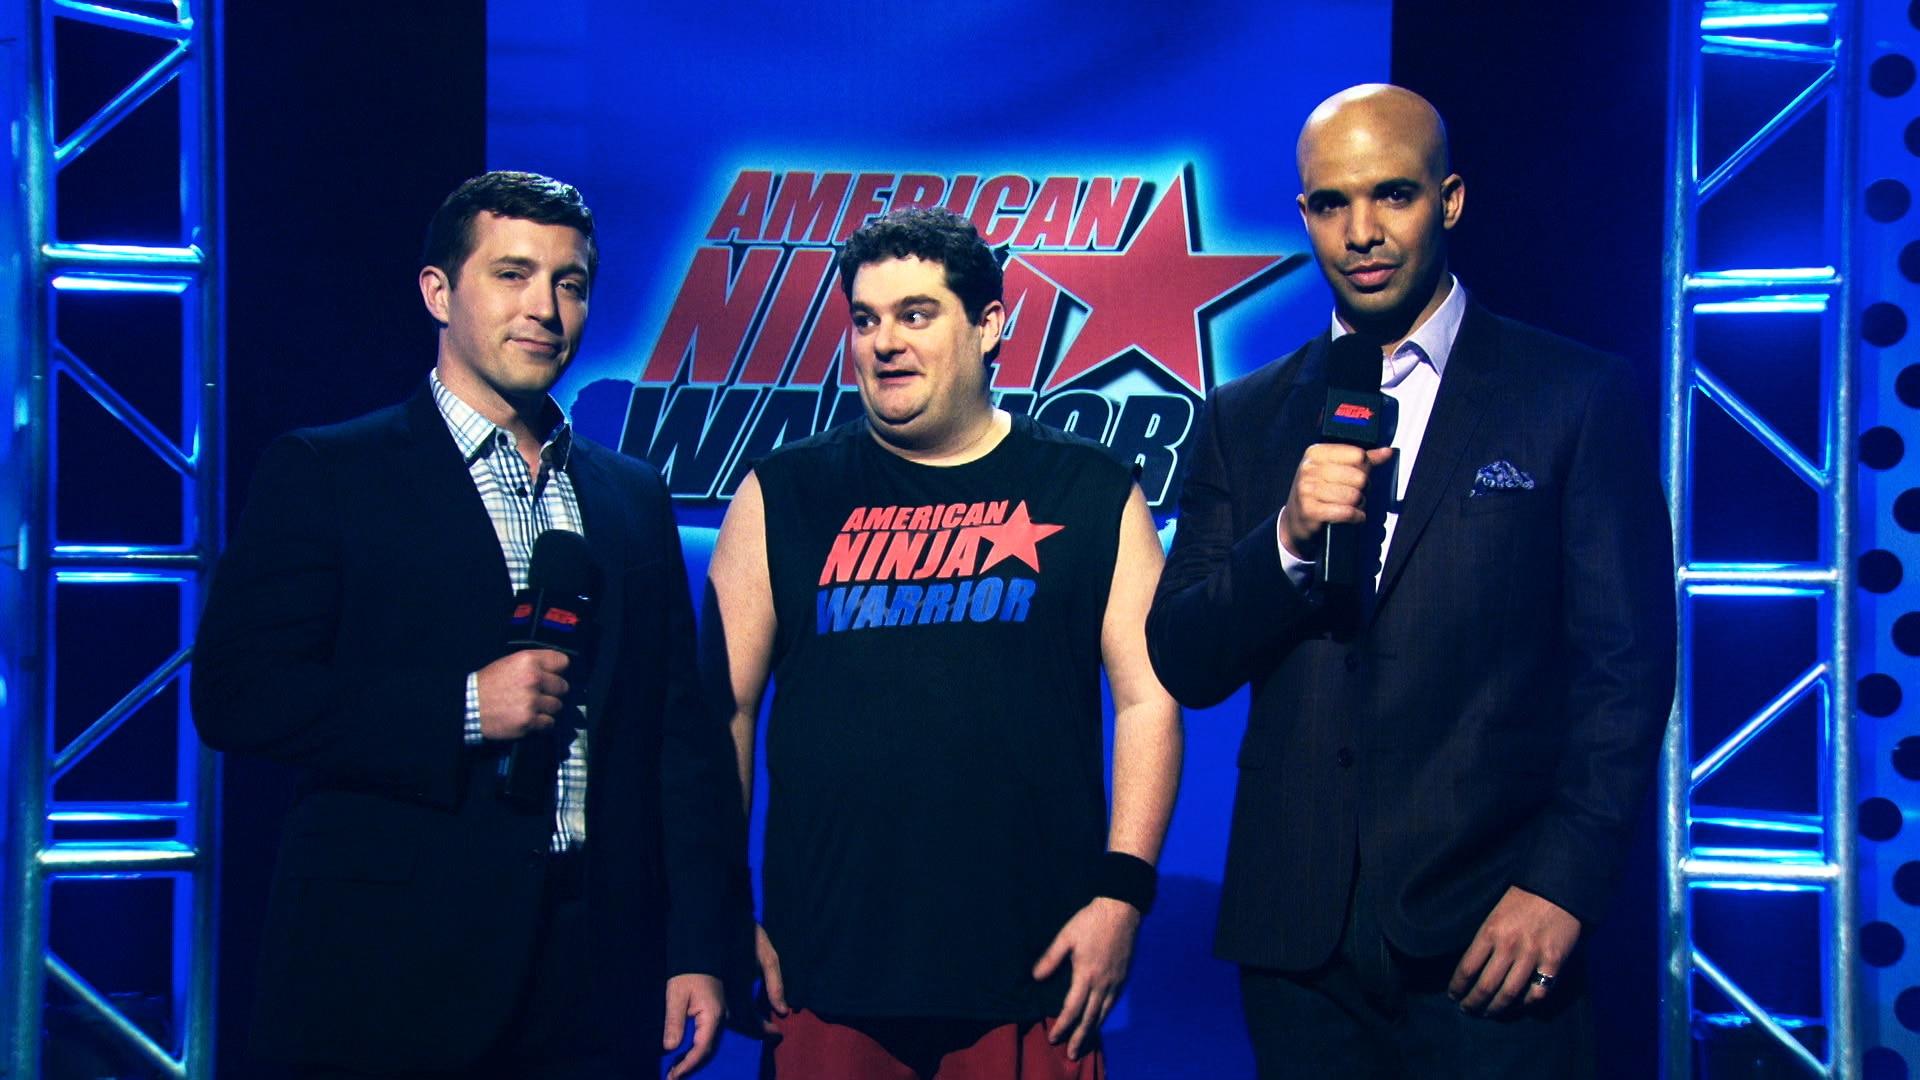 Watch Saturday Night Live Highlight: American Ninja ...